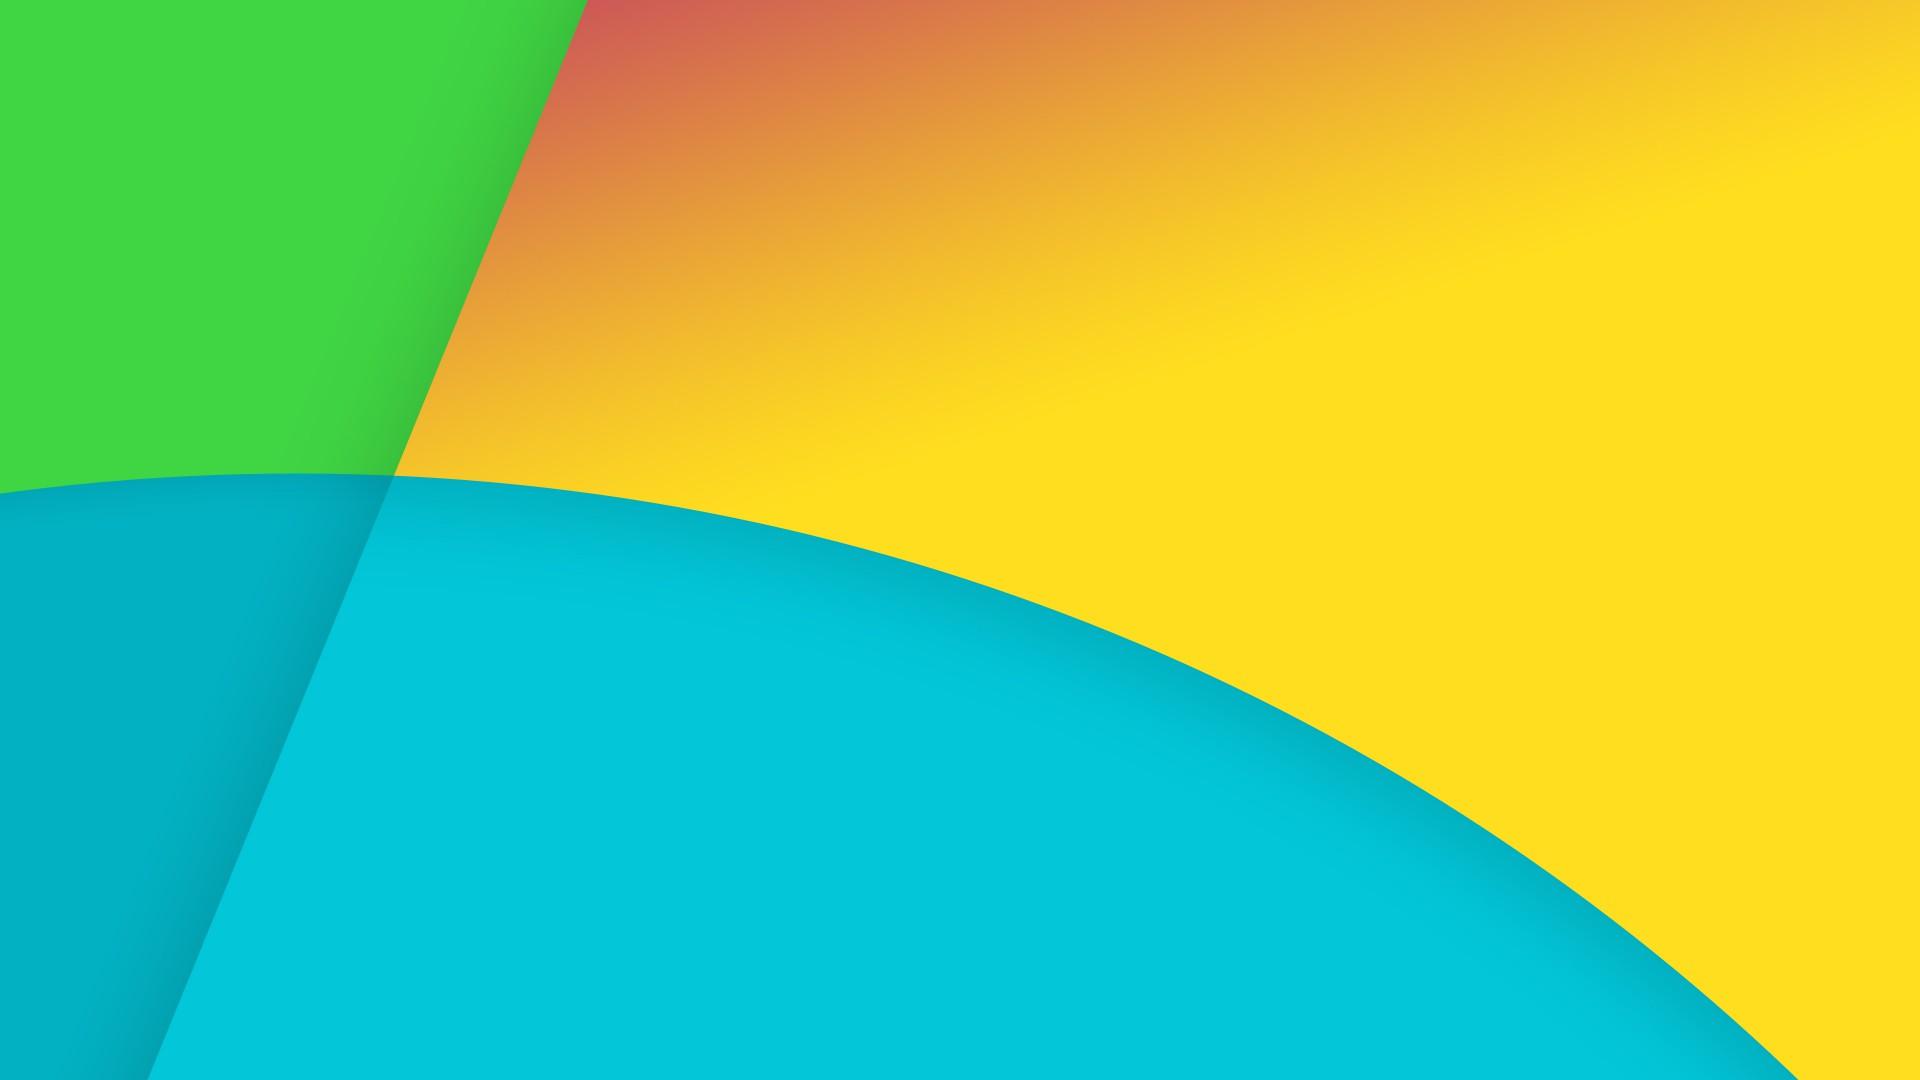 Wallpaper Android 4k 5k Wallpaper Abstract Yellow